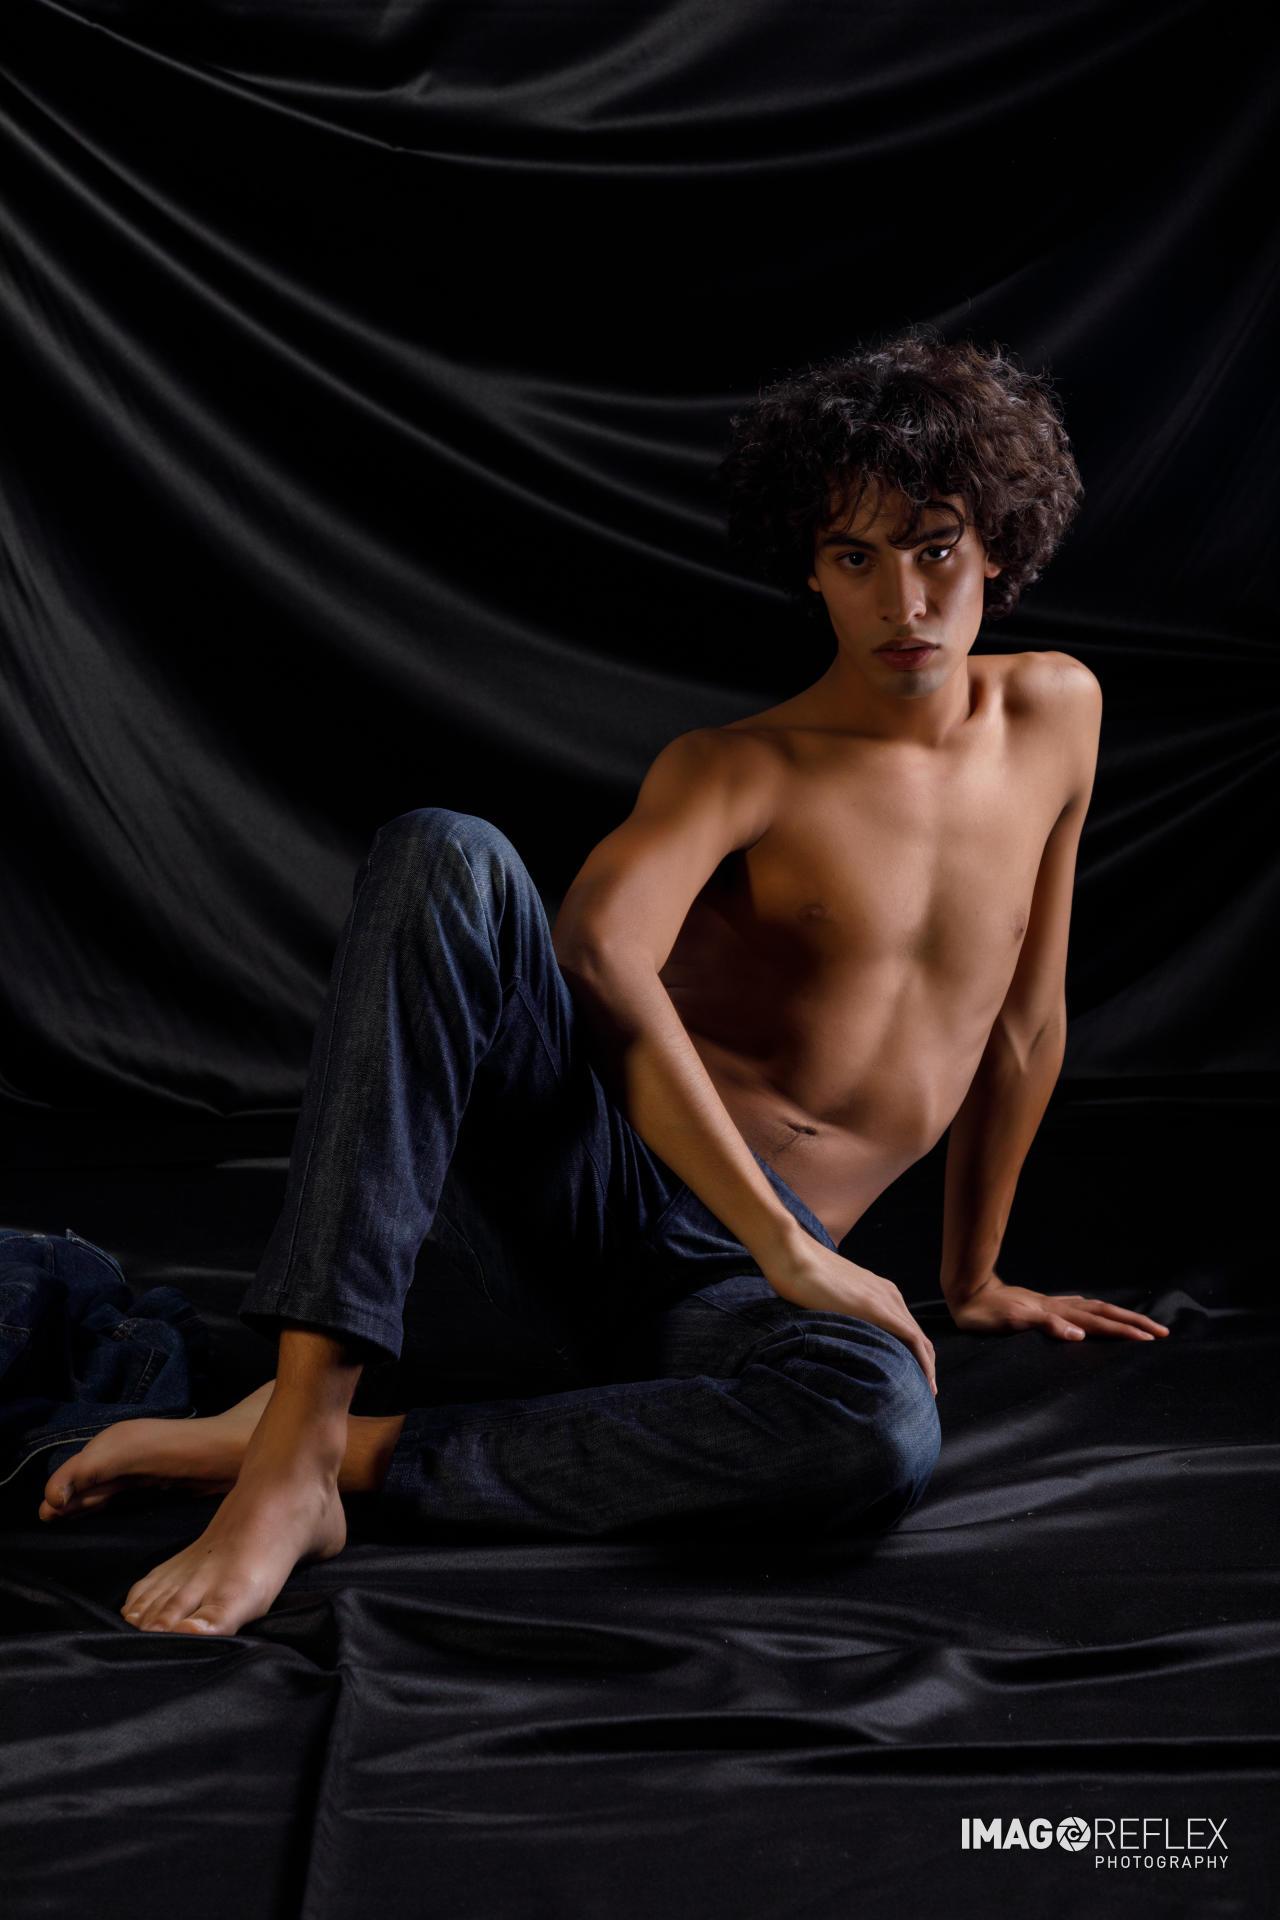 Dylan Garcia Villarreal